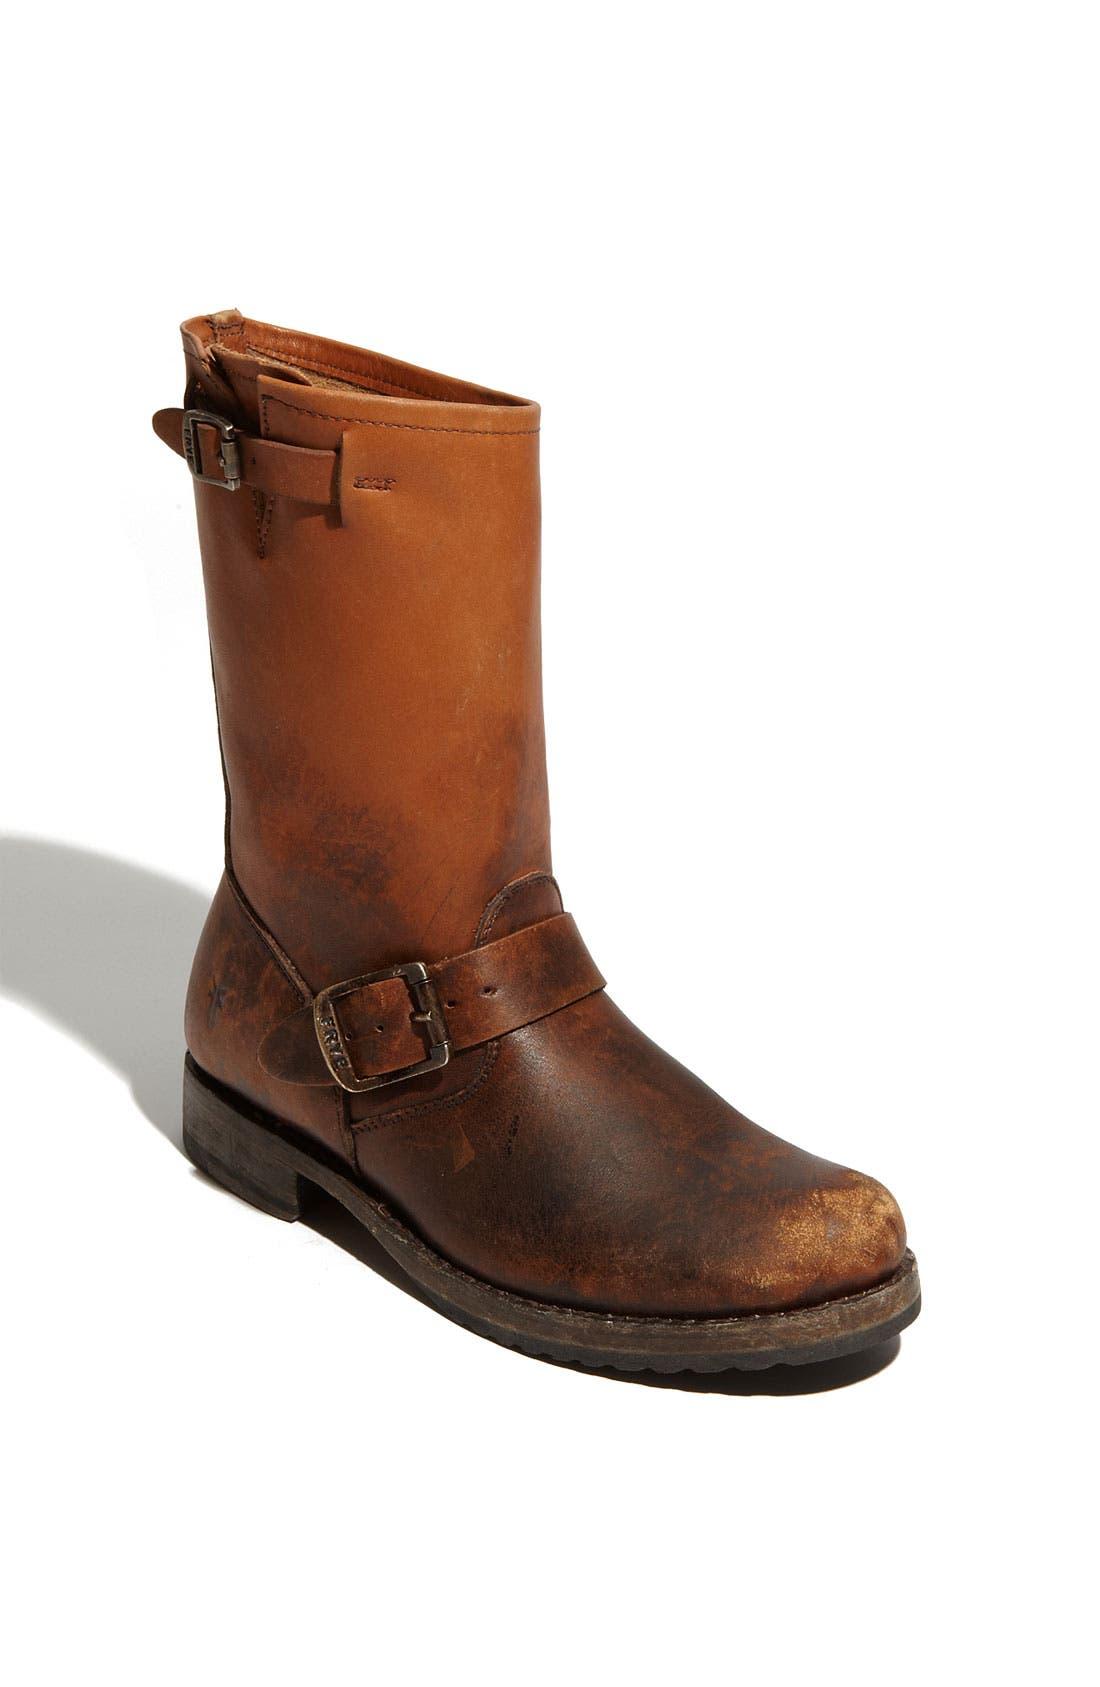 Main Image - Frye 'Veronica' Boot